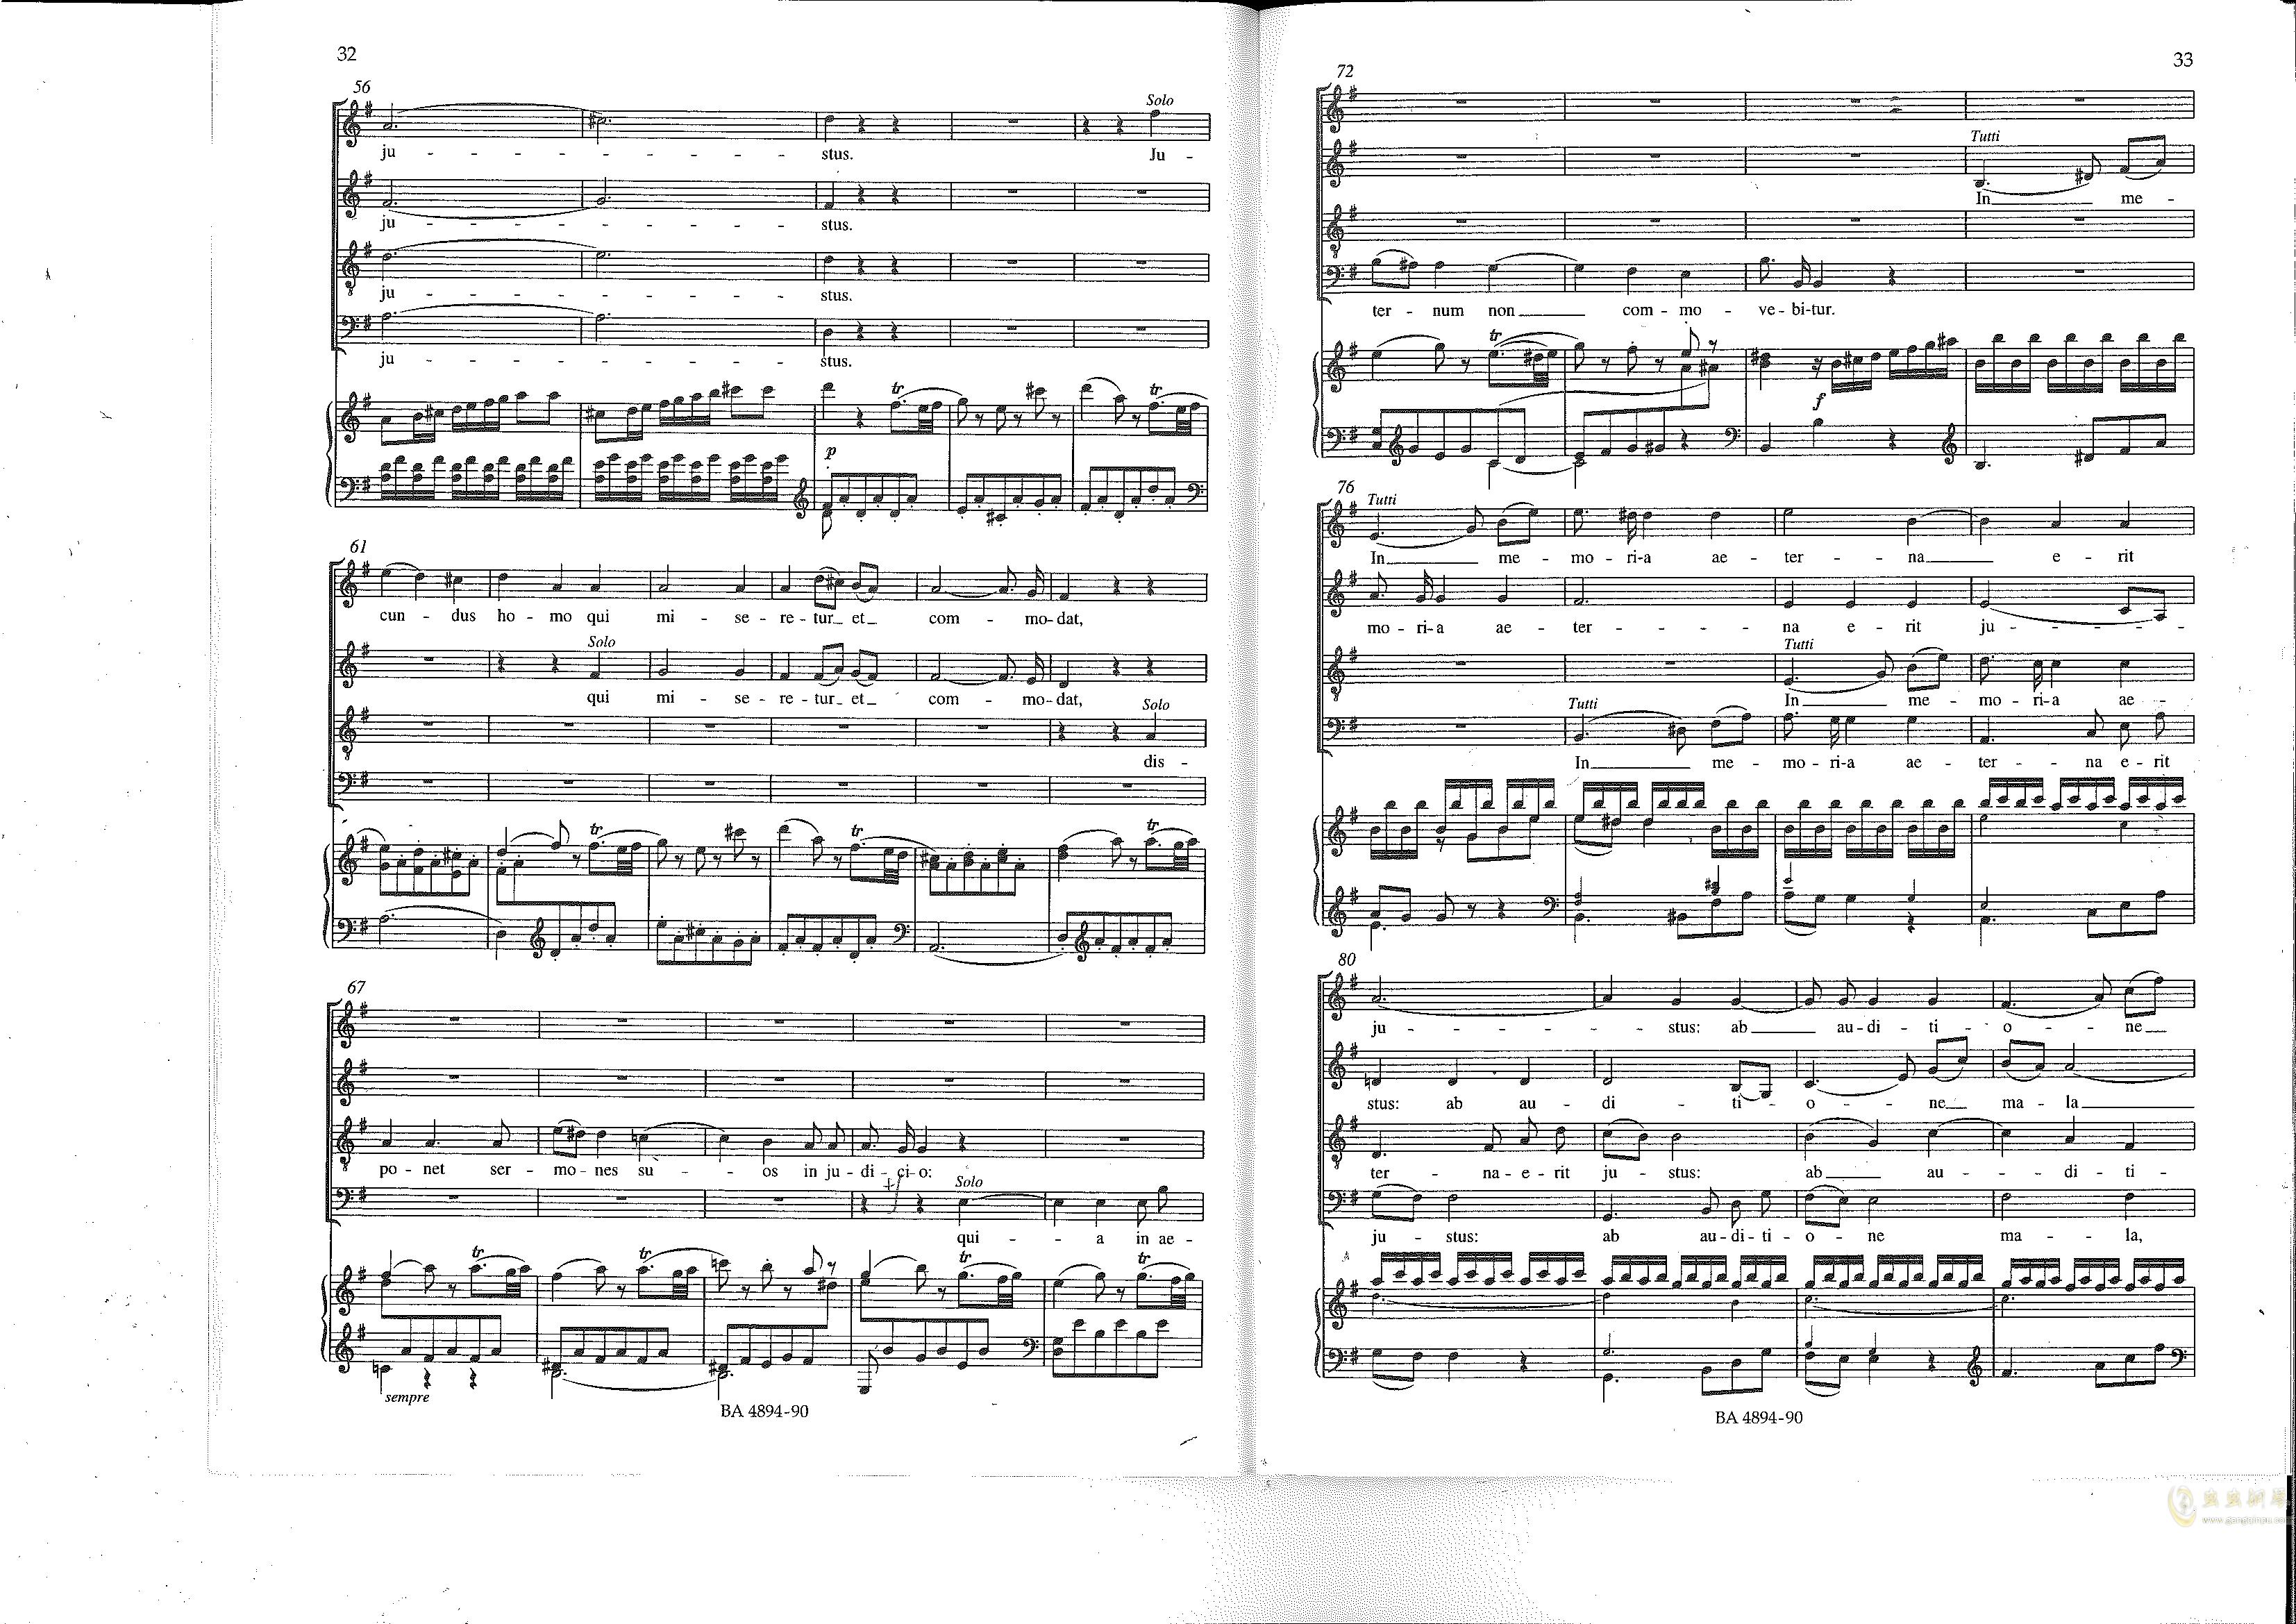 Vesperae solennes de confessore K. 339钢琴谱 第17页